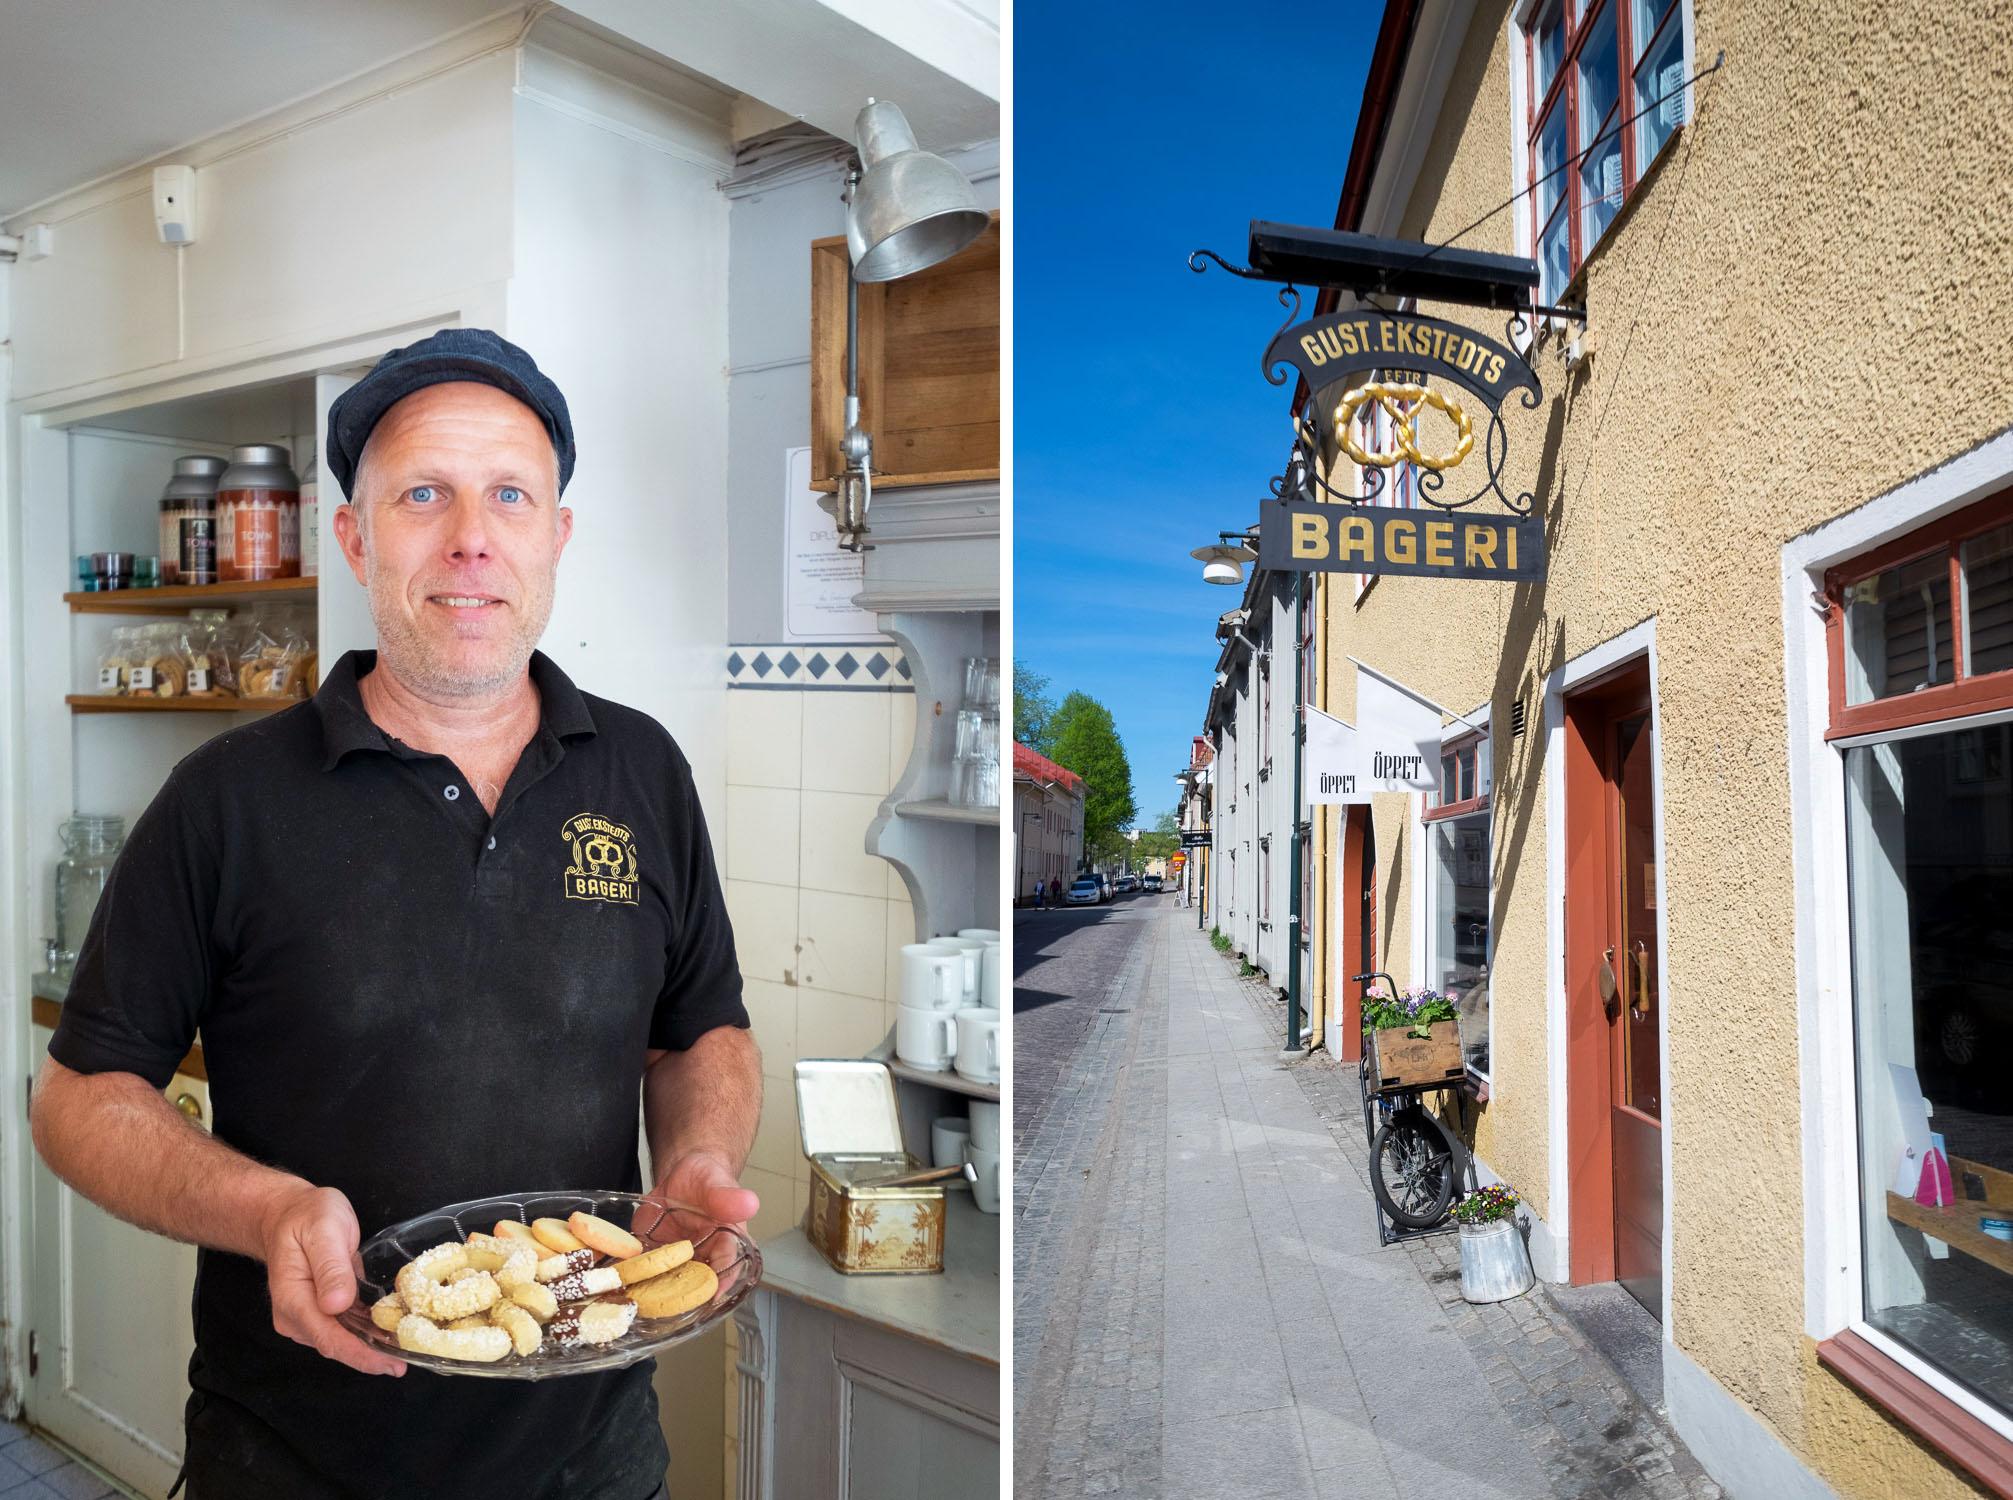 Fika tour in Alingsas, West Sweden